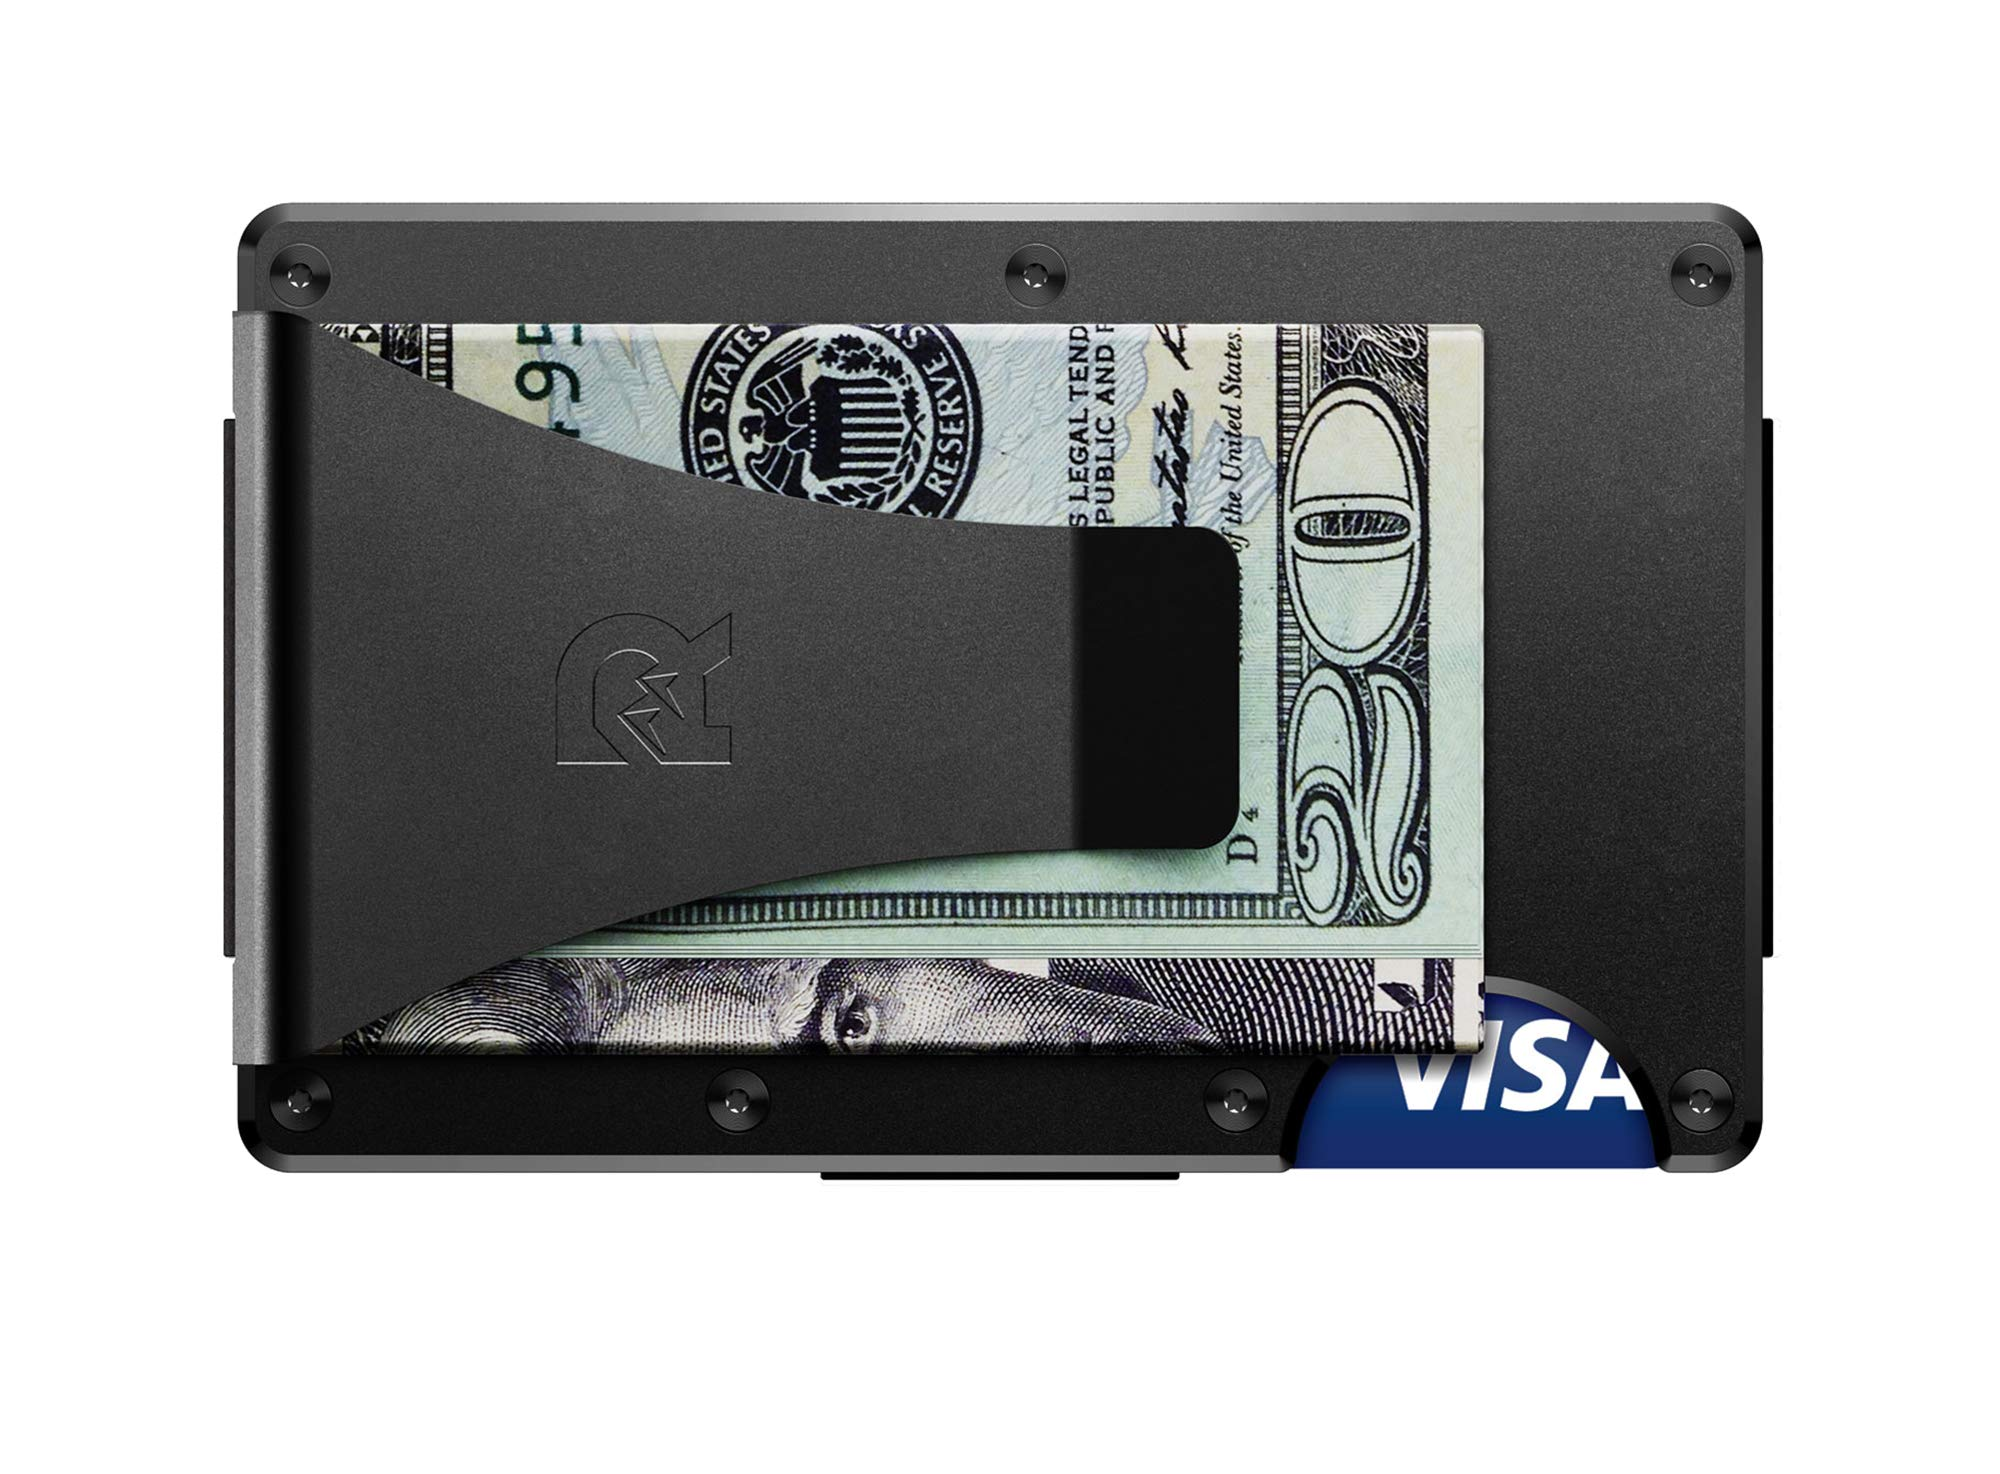 The Ridge Authentic Minimalist Metal RFID Blocking Wallet - Money Clip (Black)